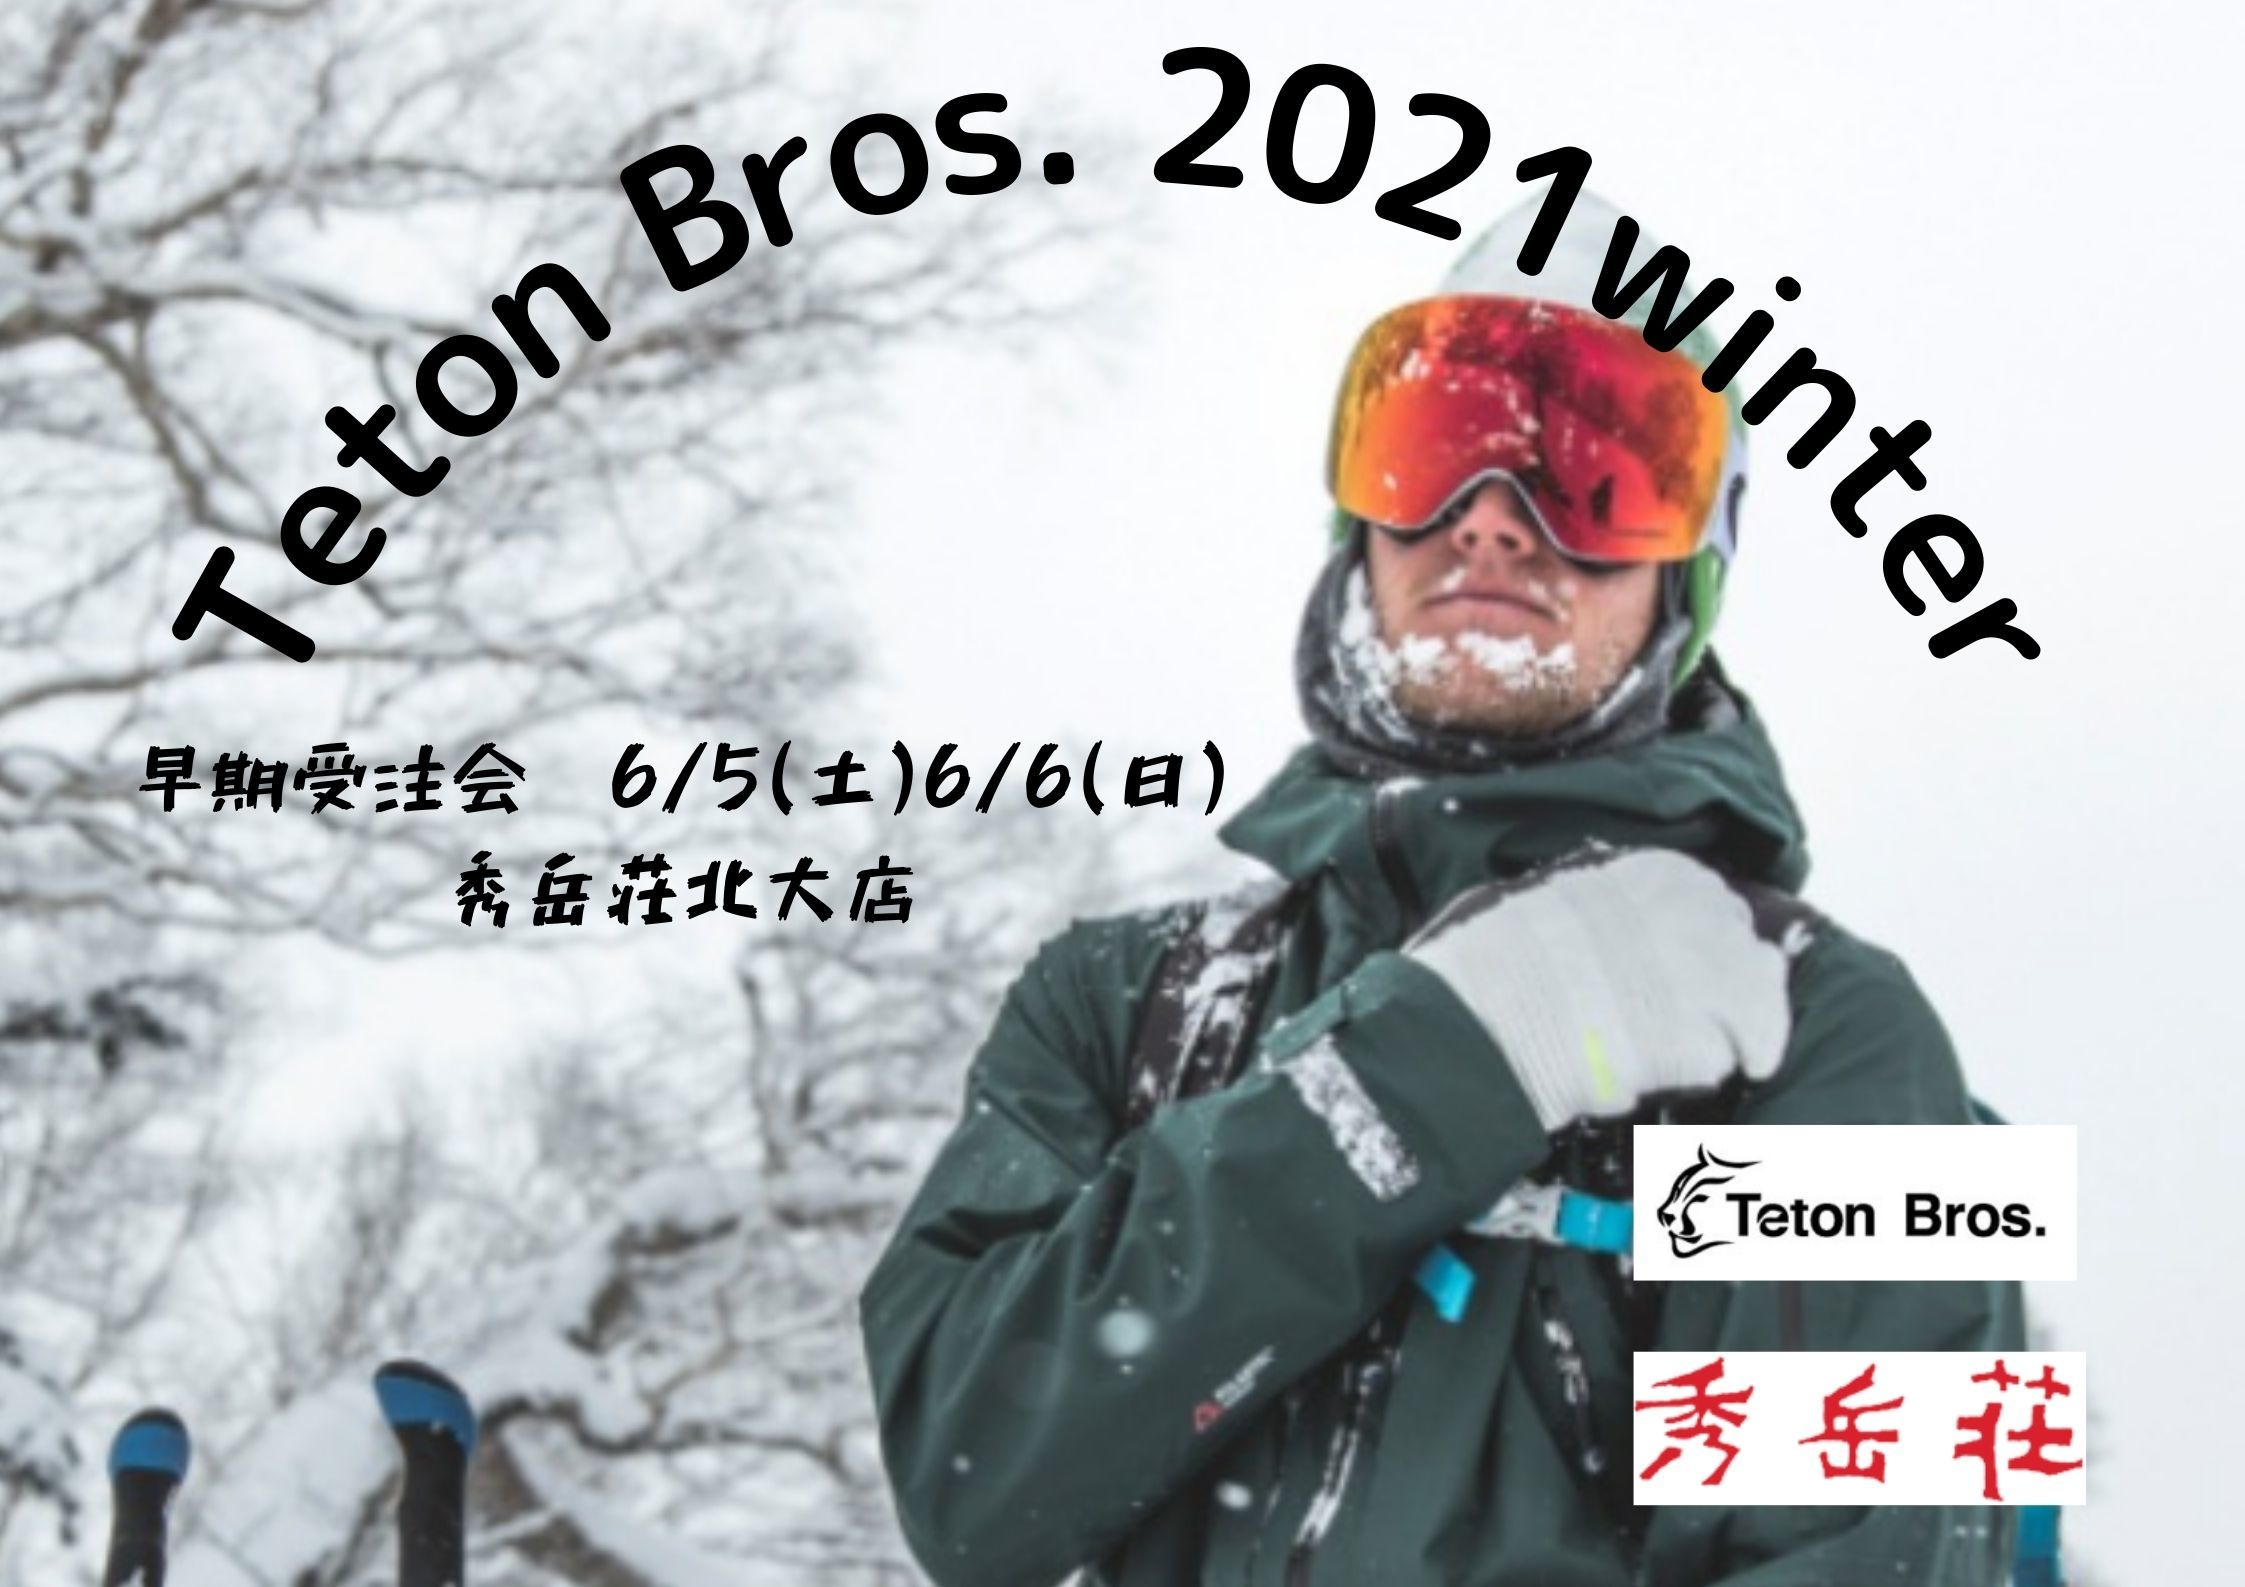 Teton Bros.のAxio !_d0198793_14273747.jpg